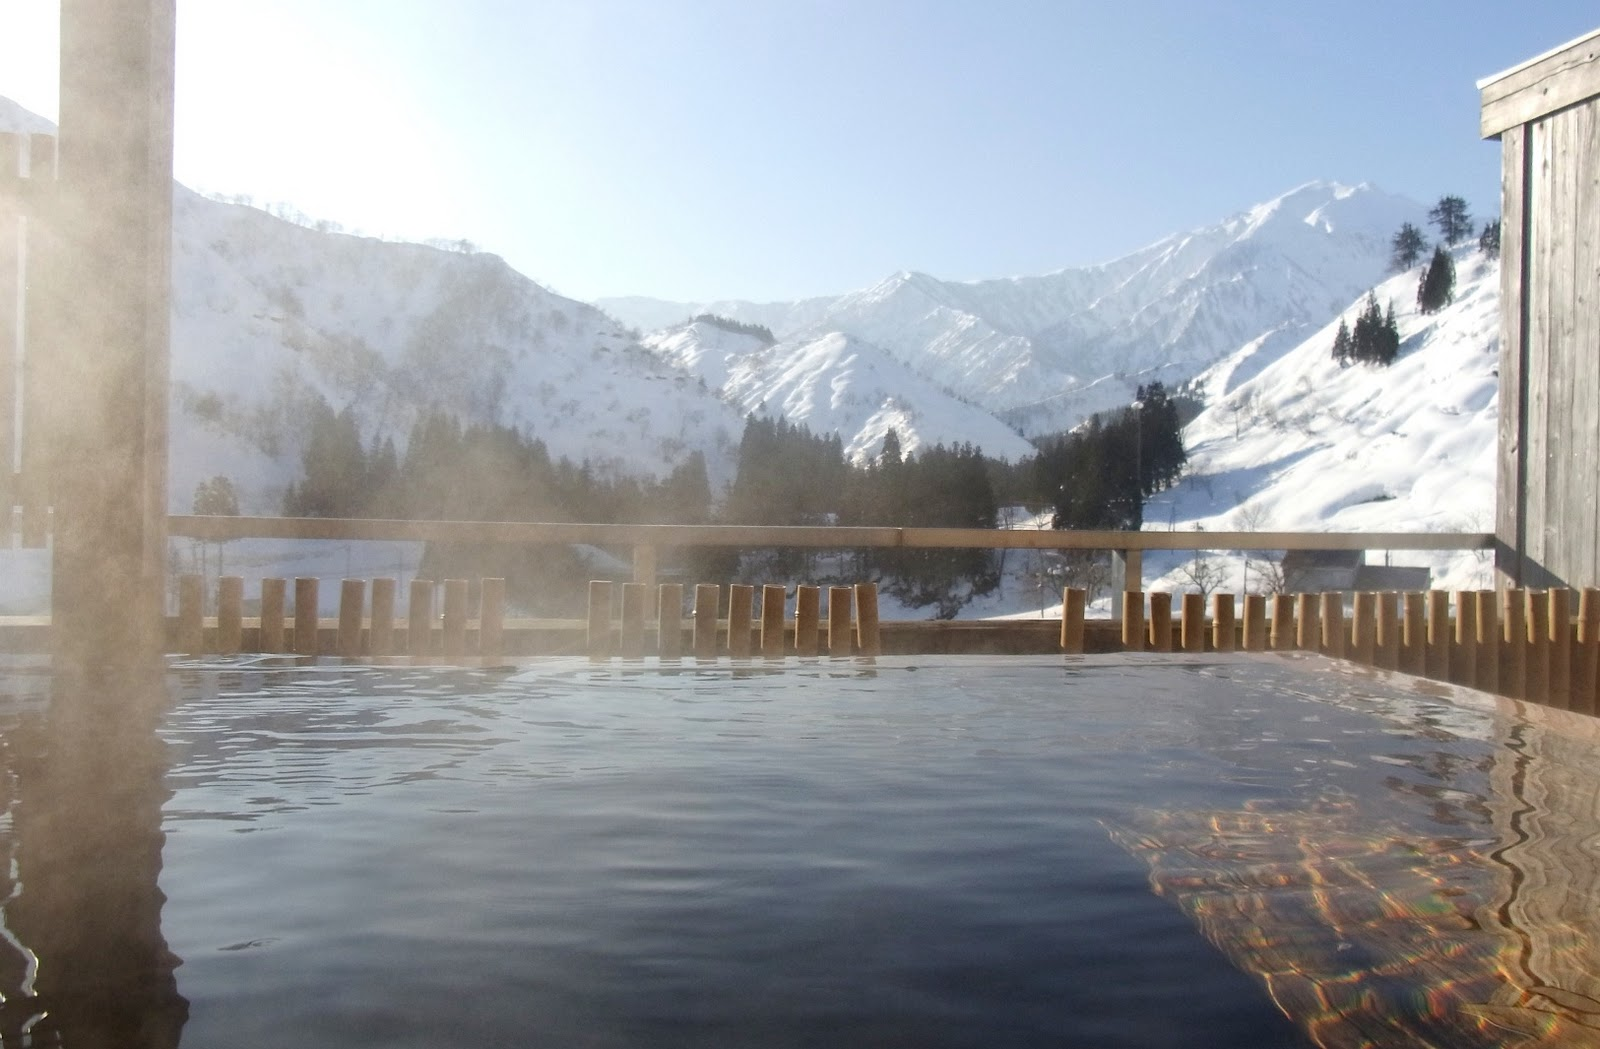 Jovialidade Do TAKA: 大湯温泉の屋上露天風呂に浸か...  大湯温泉の屋上露